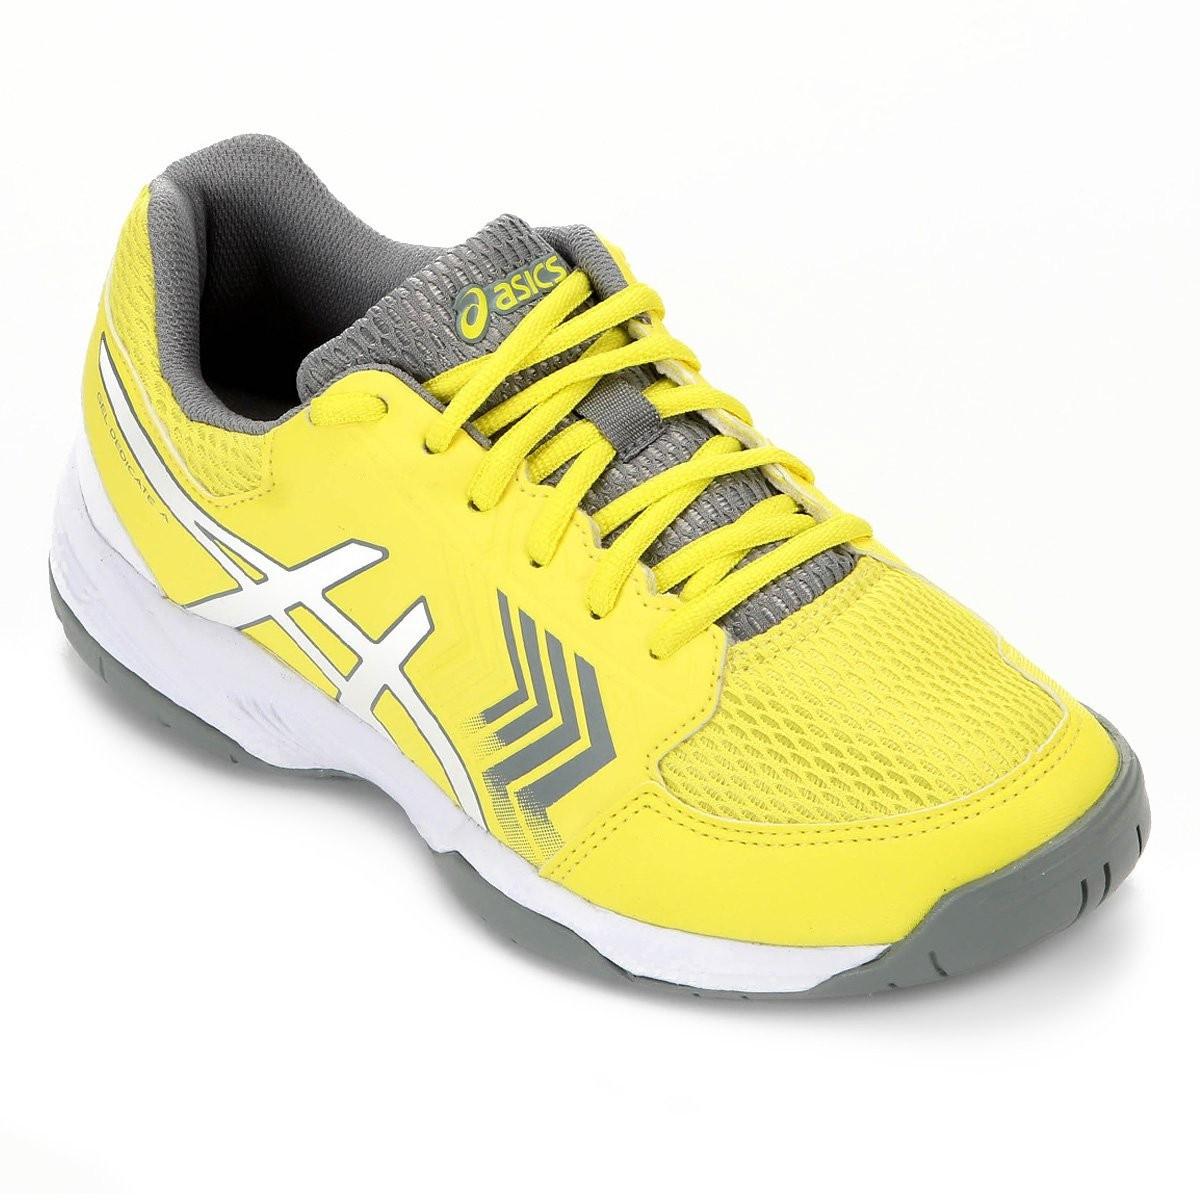 Tênis Asics Gel-Dedicate 5A Feminino - Amarelo